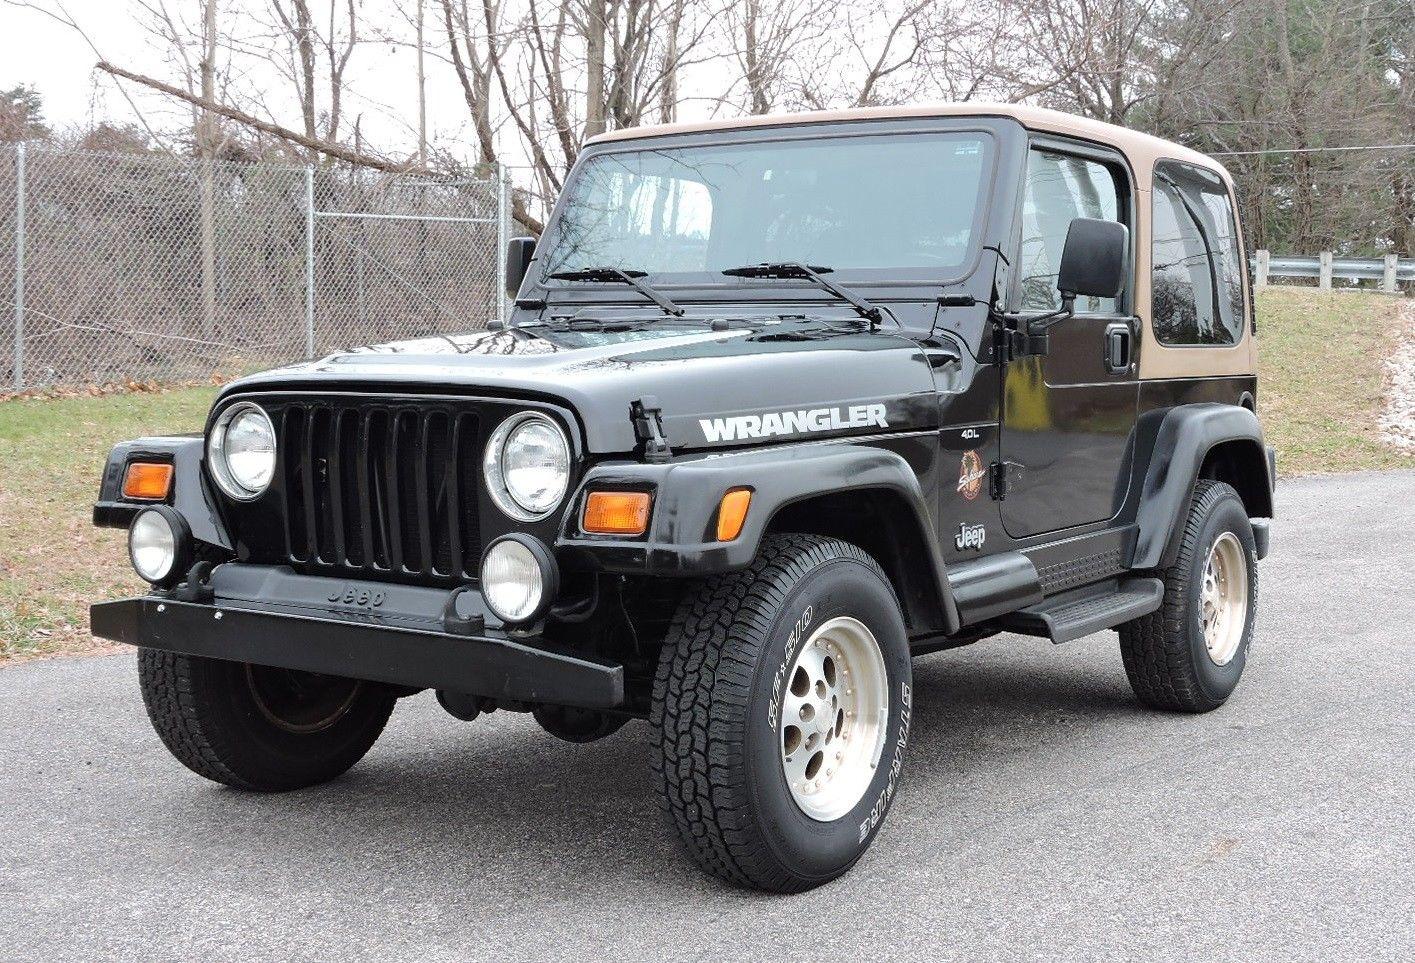 Awesome 1997 Jeep Wrangler 4 0 Sahara 4wd Both Tops 1997